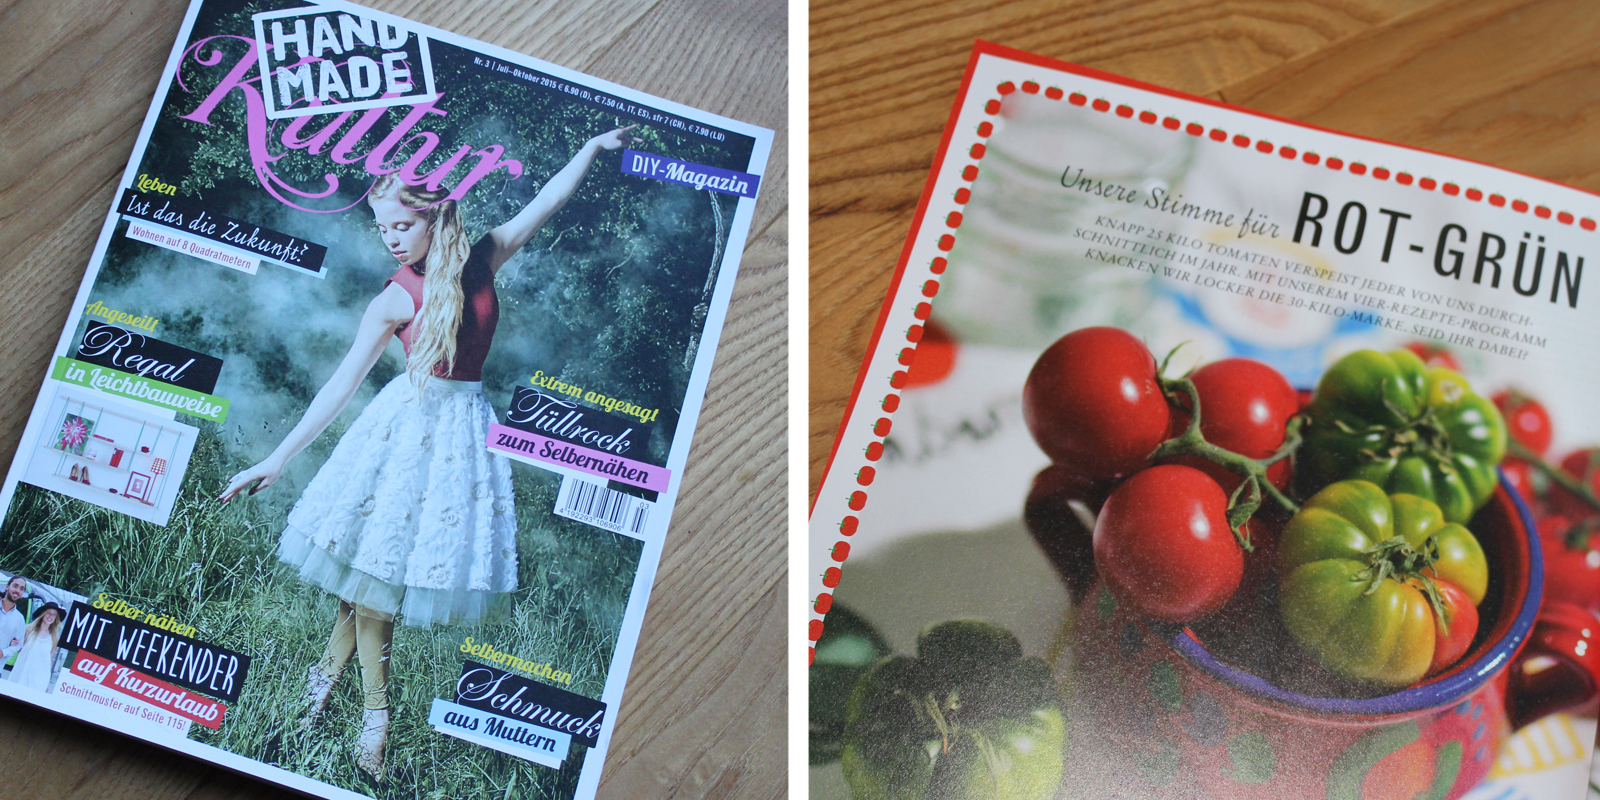 Getrocknete-Tomate-Handmade-Kultur